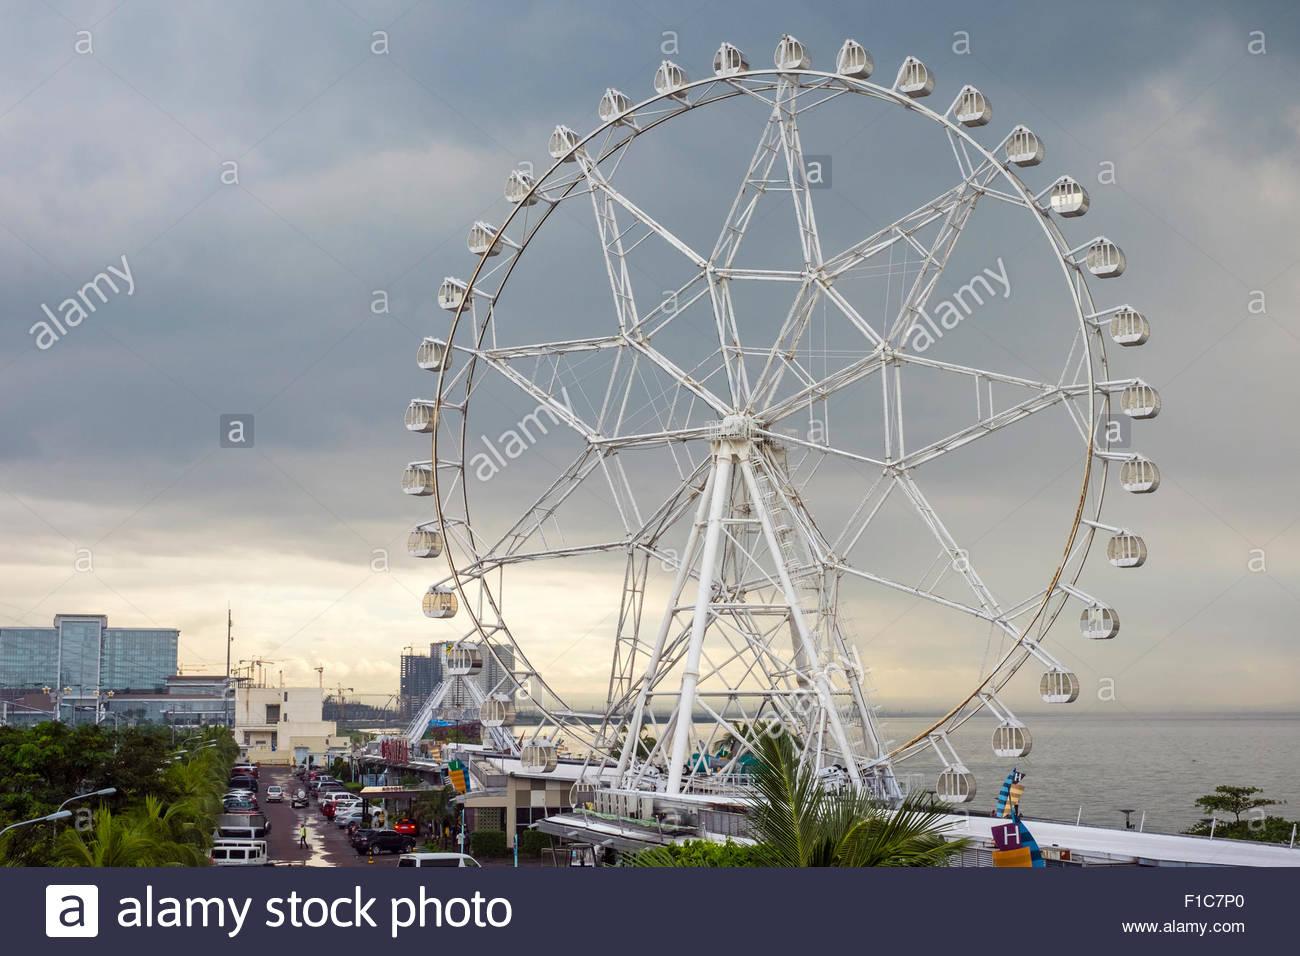 Mall of Asia Eye ferris wheel on Manila Bay, Pasay, Manila, National Capital Region, Philippines - Stock Image